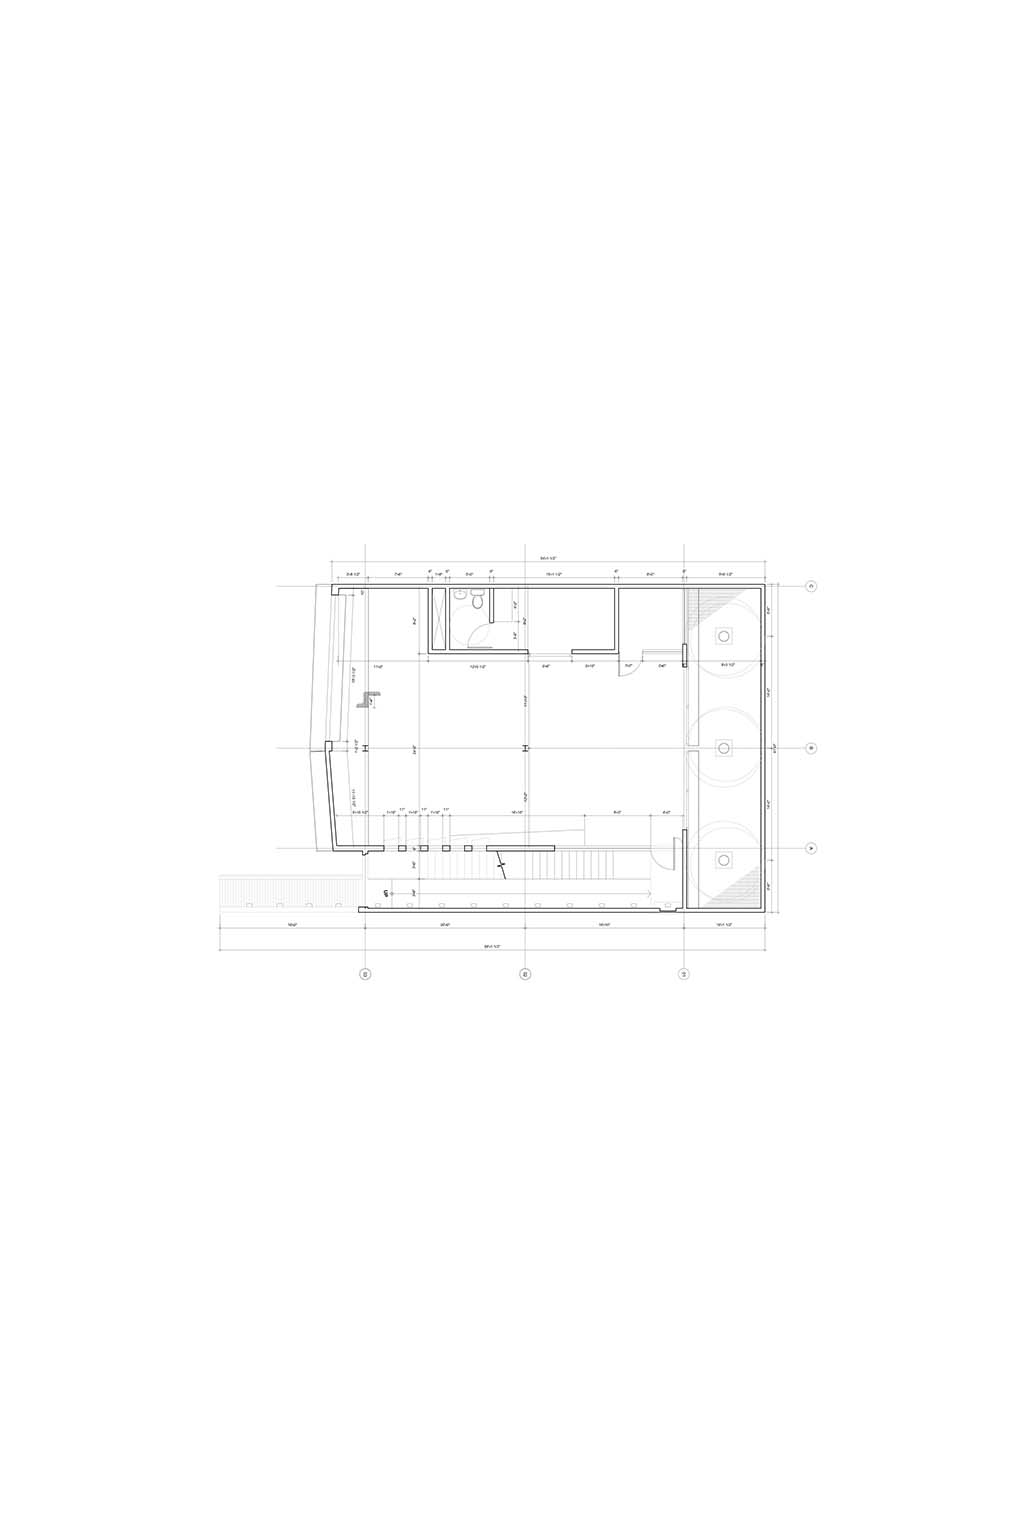 planta primer nivel-original_001